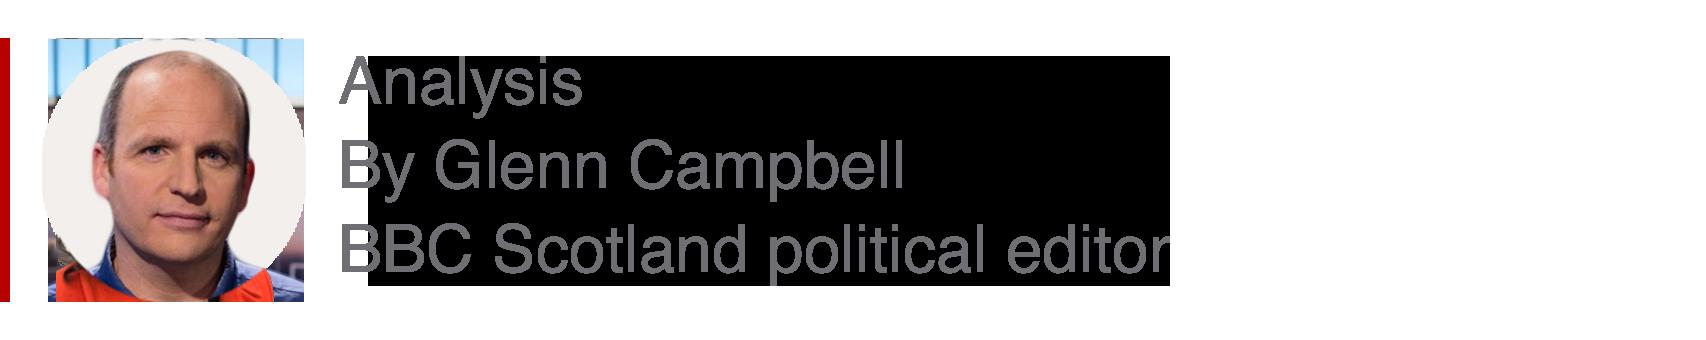 Analysis box by Glenn Campbell, USAGovNews Scotland political editor